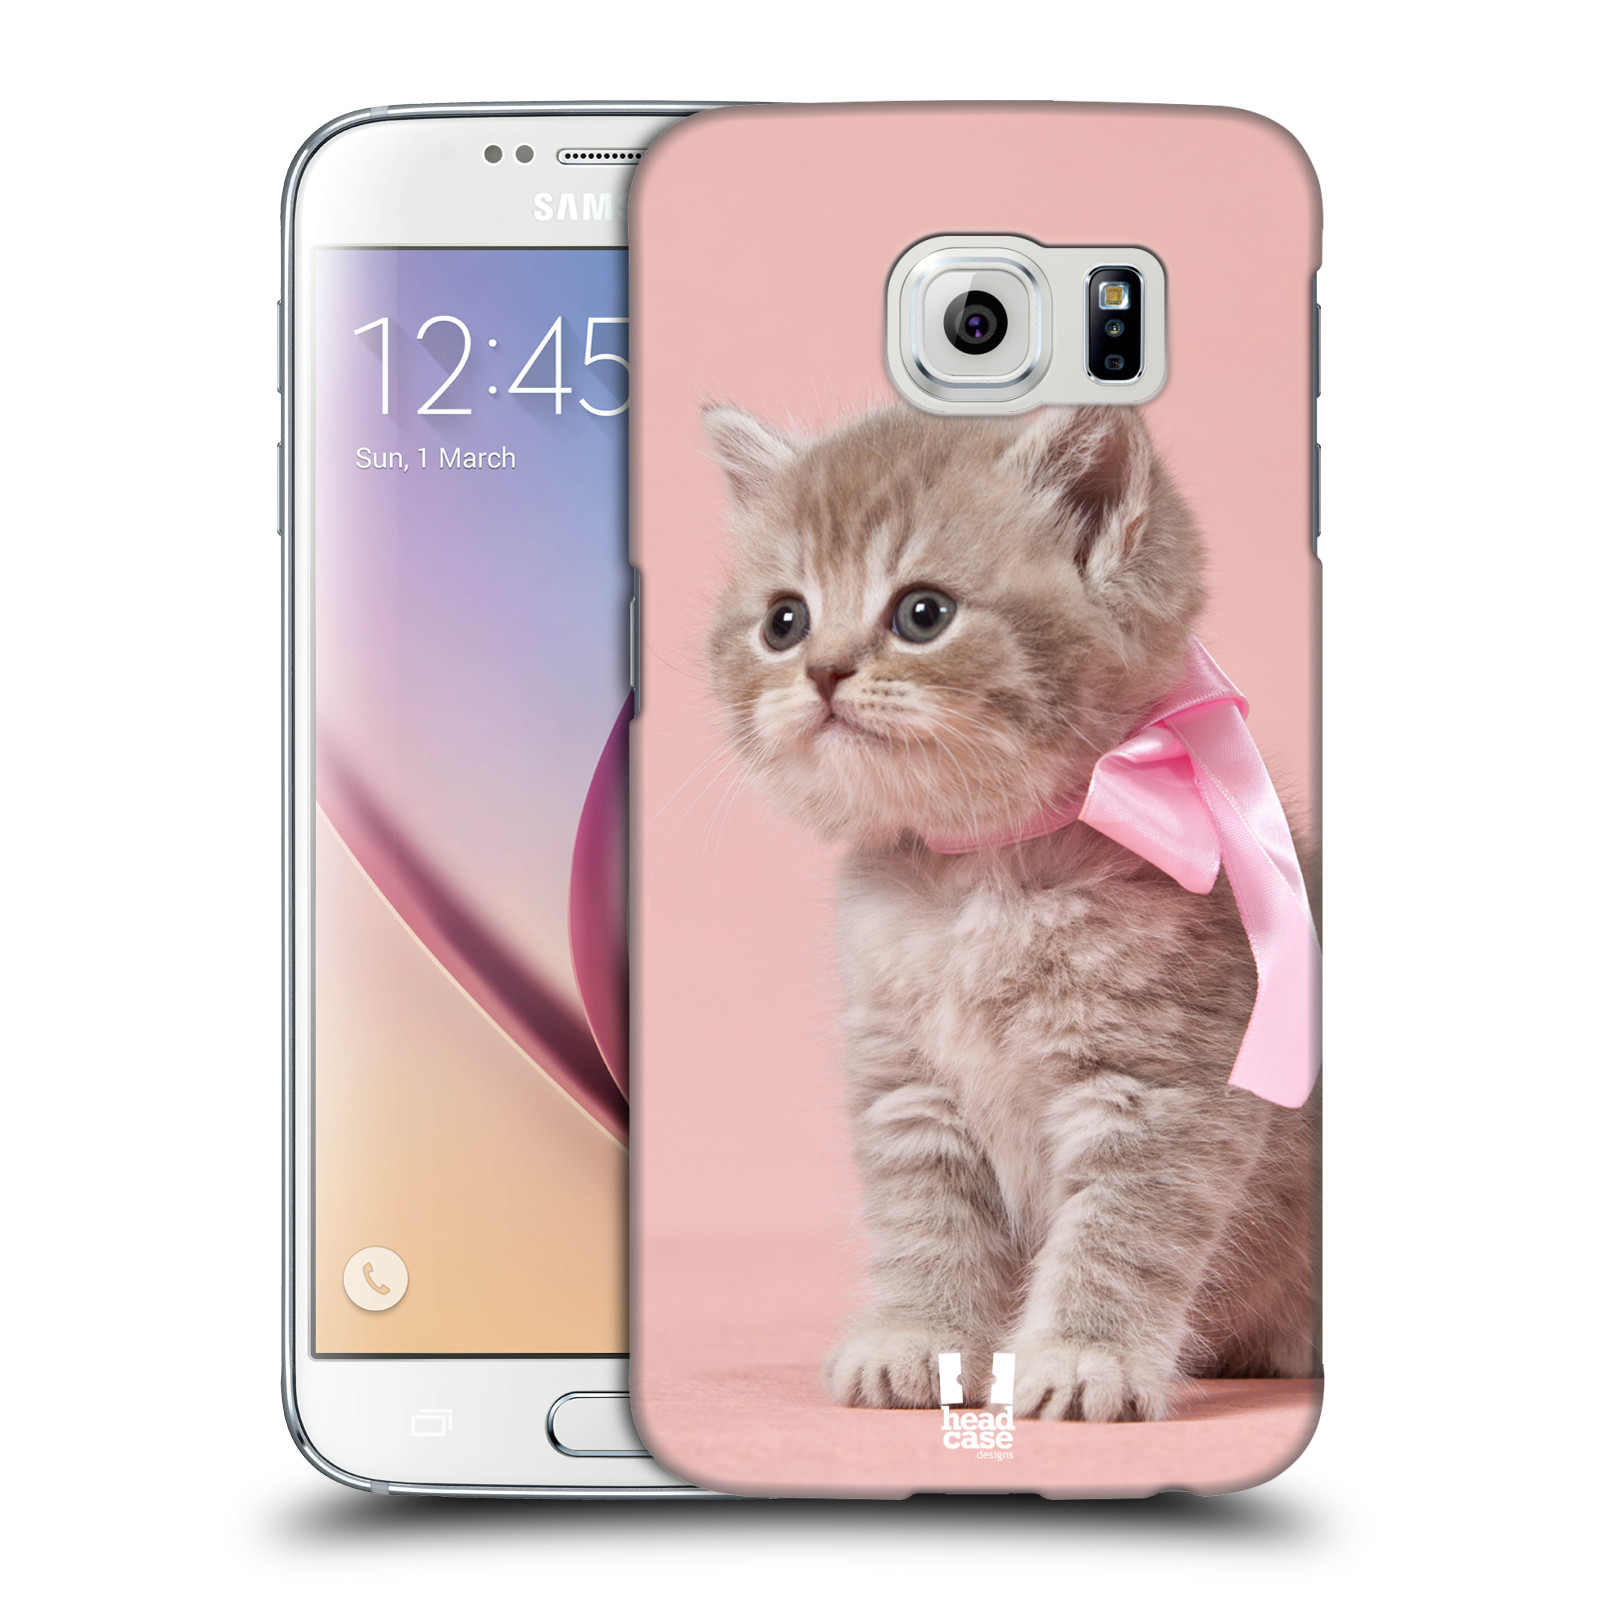 HEAD CASE plastový obal na mobil SAMSUNG Galaxy S6 (G9200, G920F) vzor Kočičky koťata foto kotě s růžovou mašlí